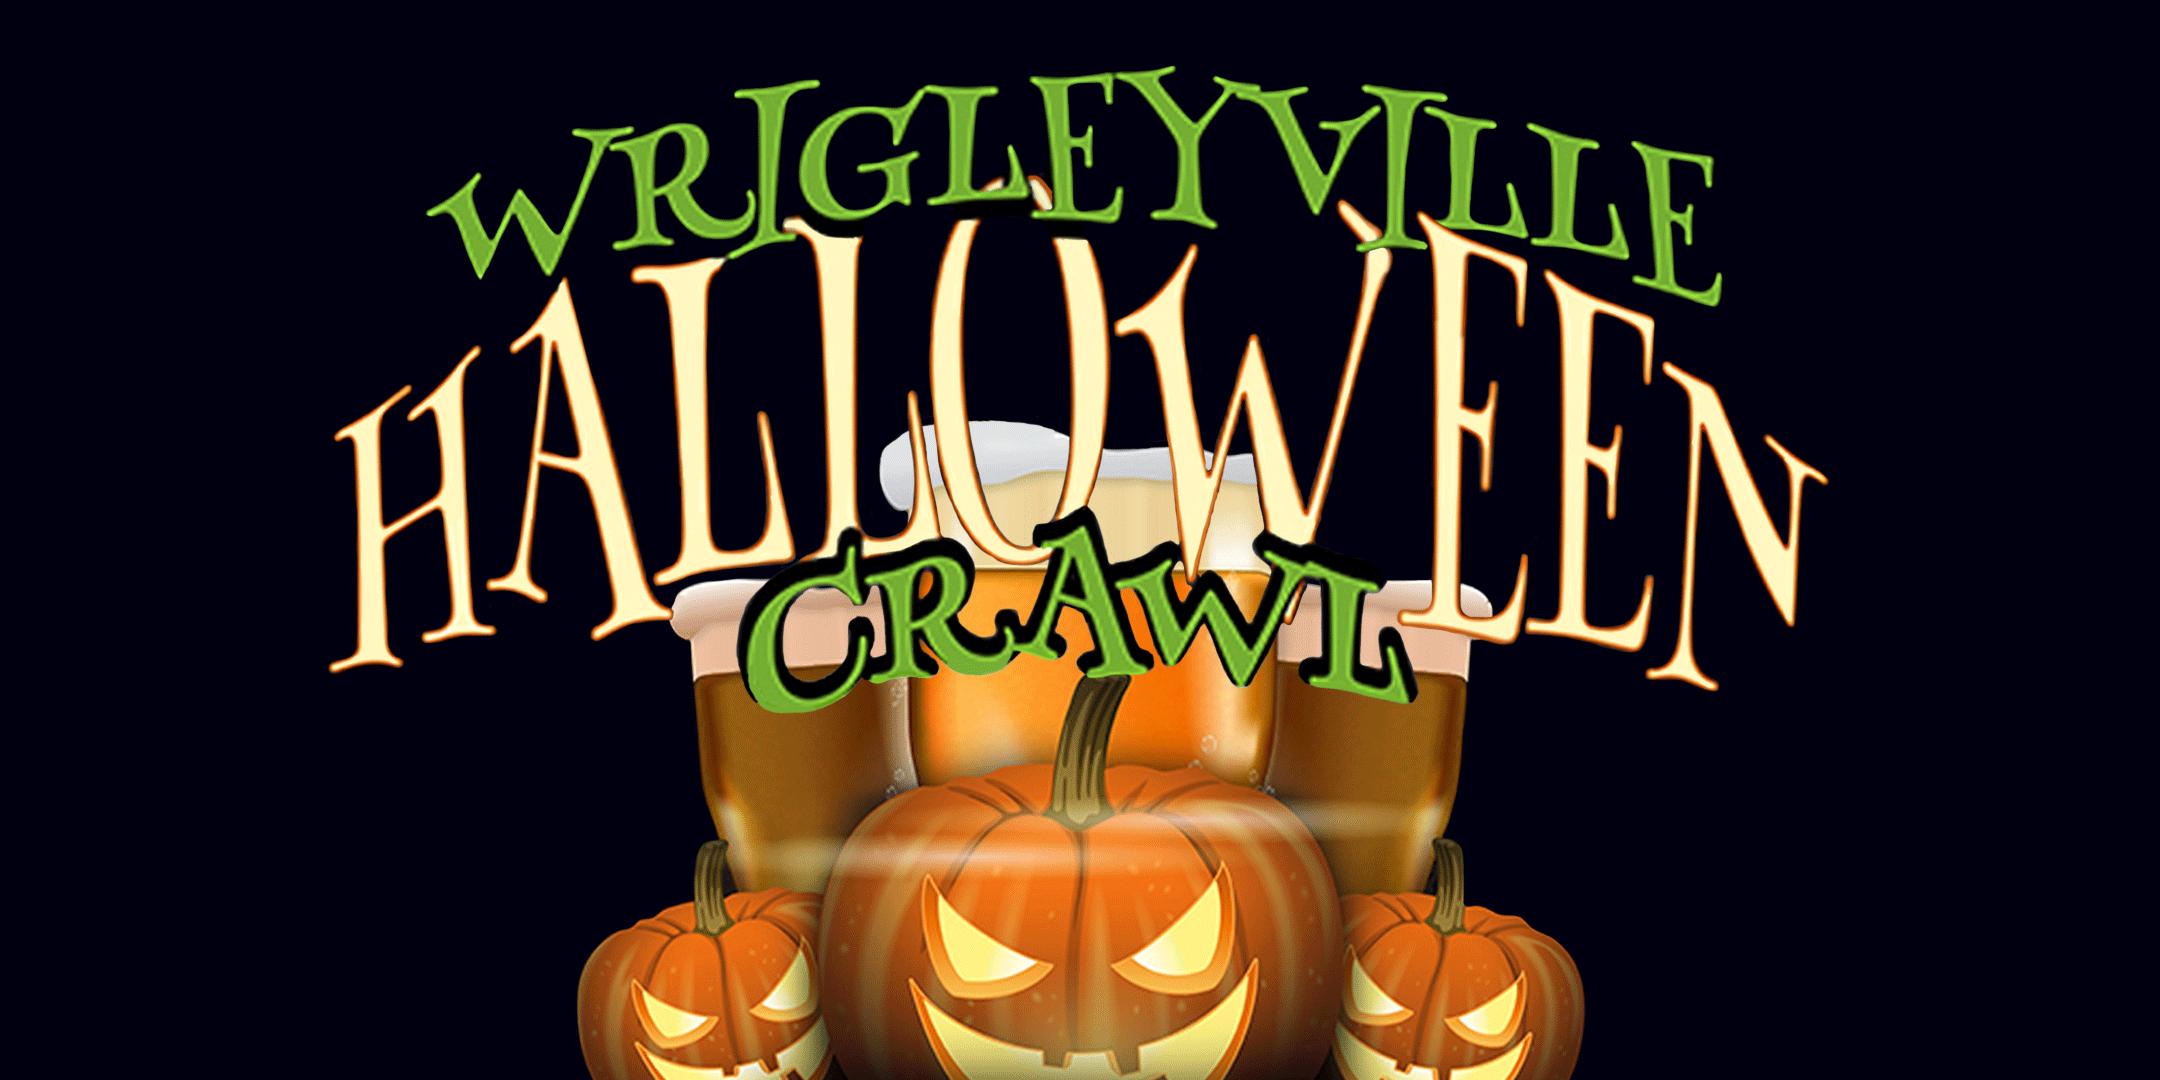 Wrigleyville Bar Crawl 2020 Halloween Wrigleyville Halloween Crawl   Chicago's BIGGEST Halloween Party